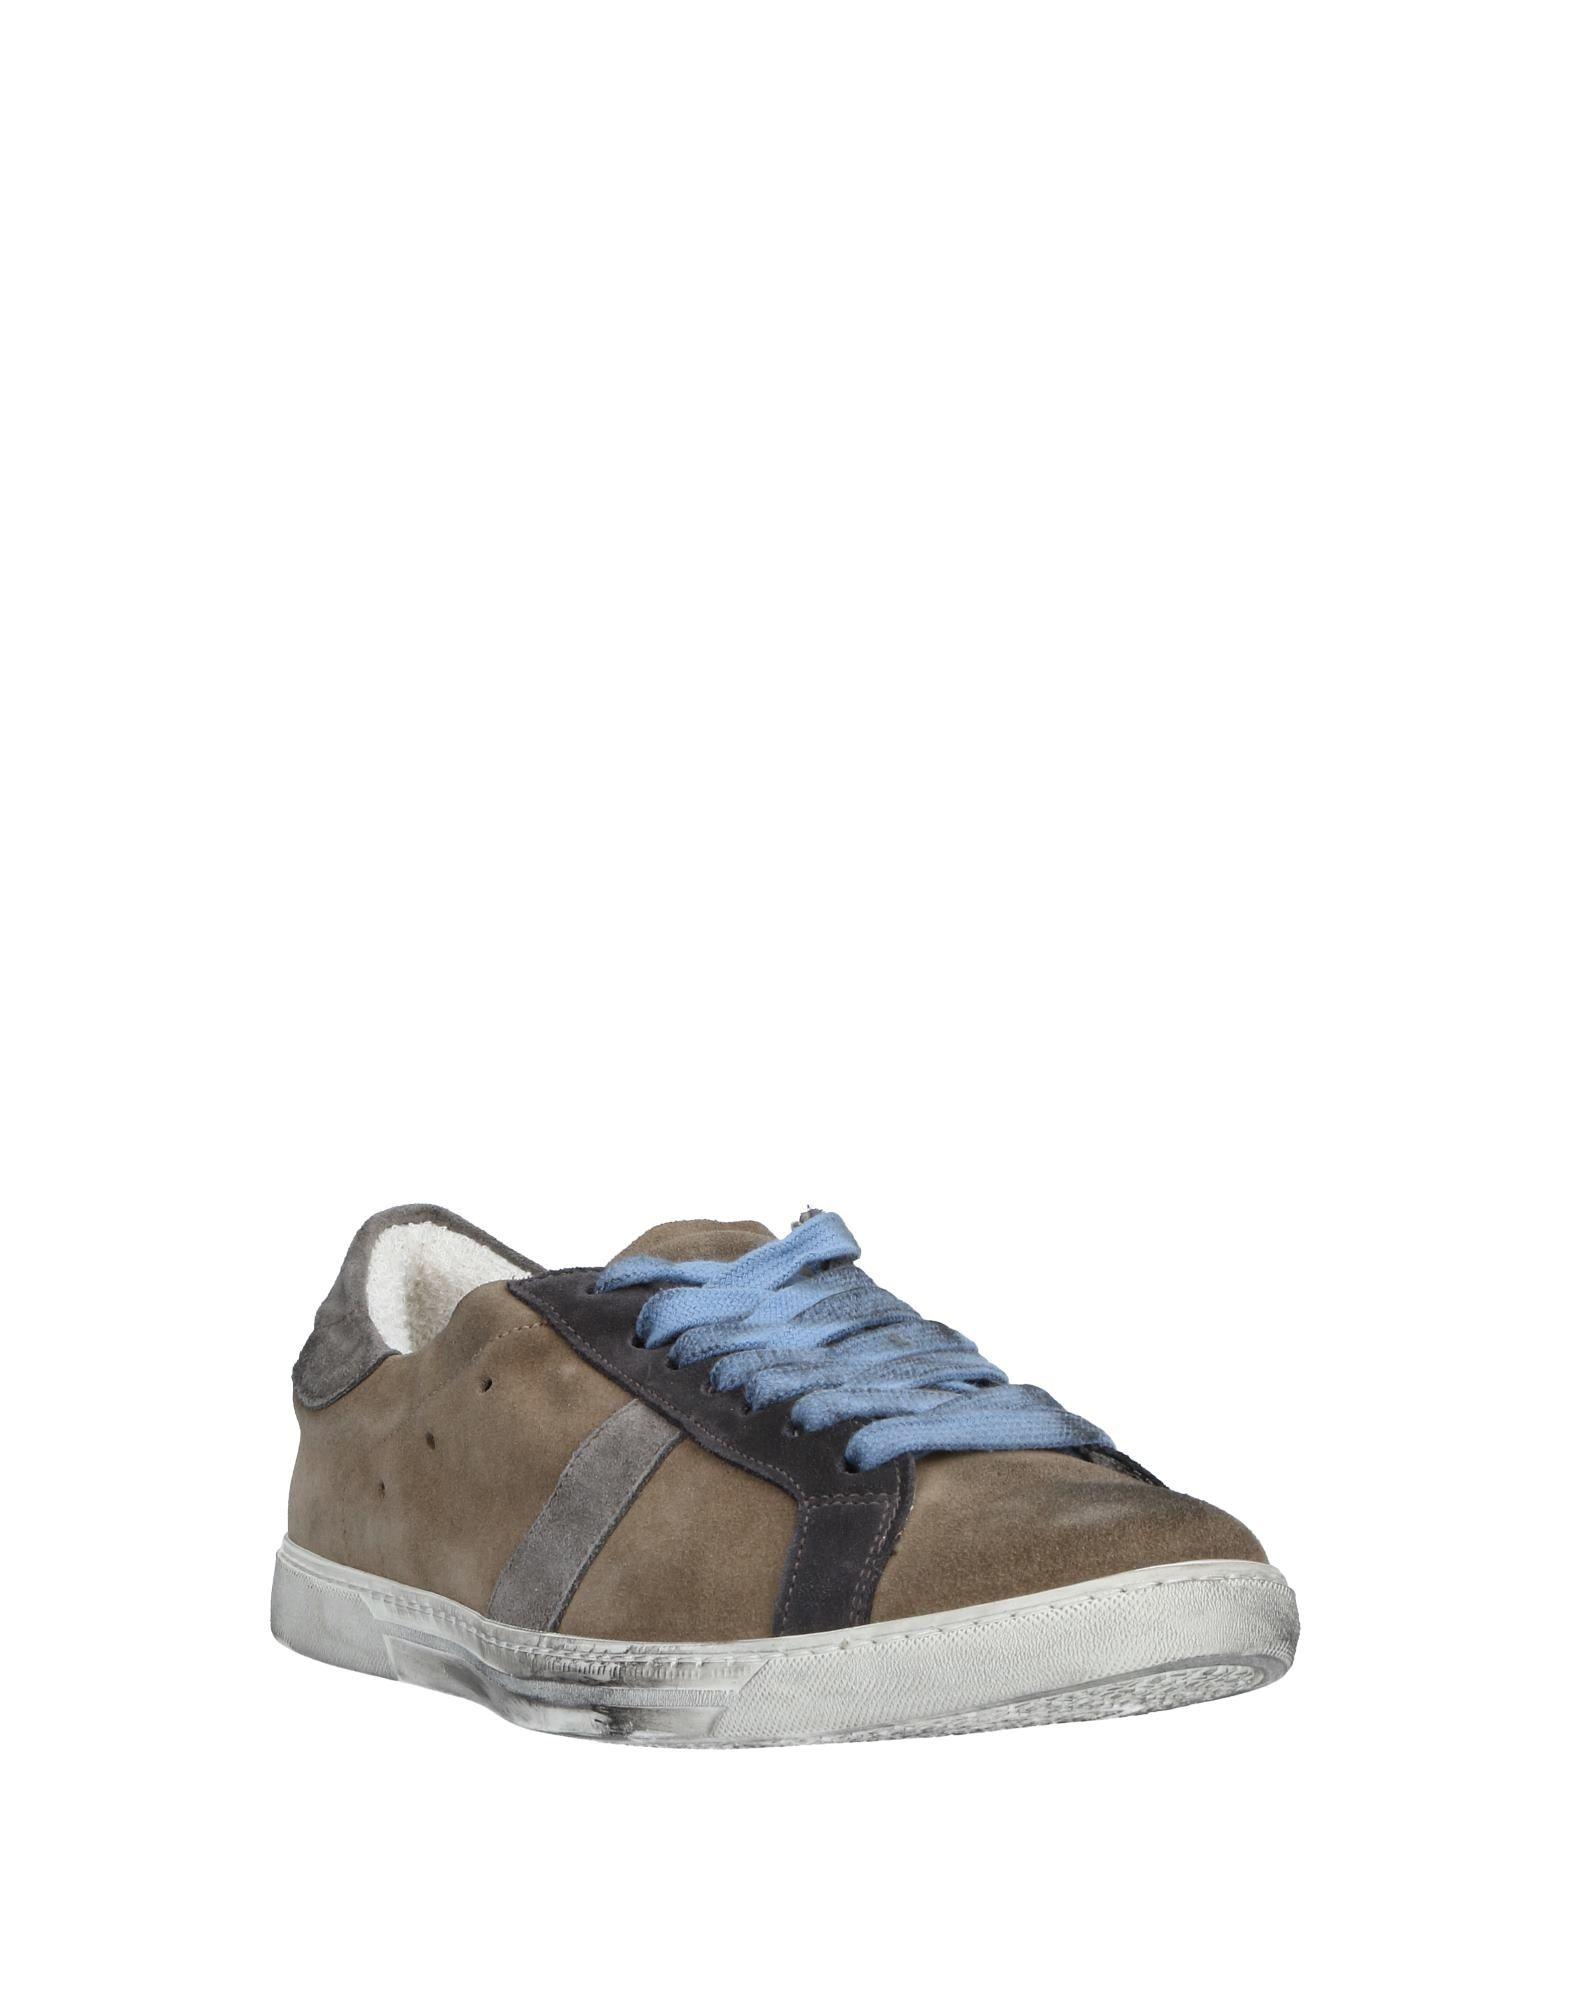 Daniele Alessandrini Homme Homme Homme Sneakers Herren  44368519PX 270364